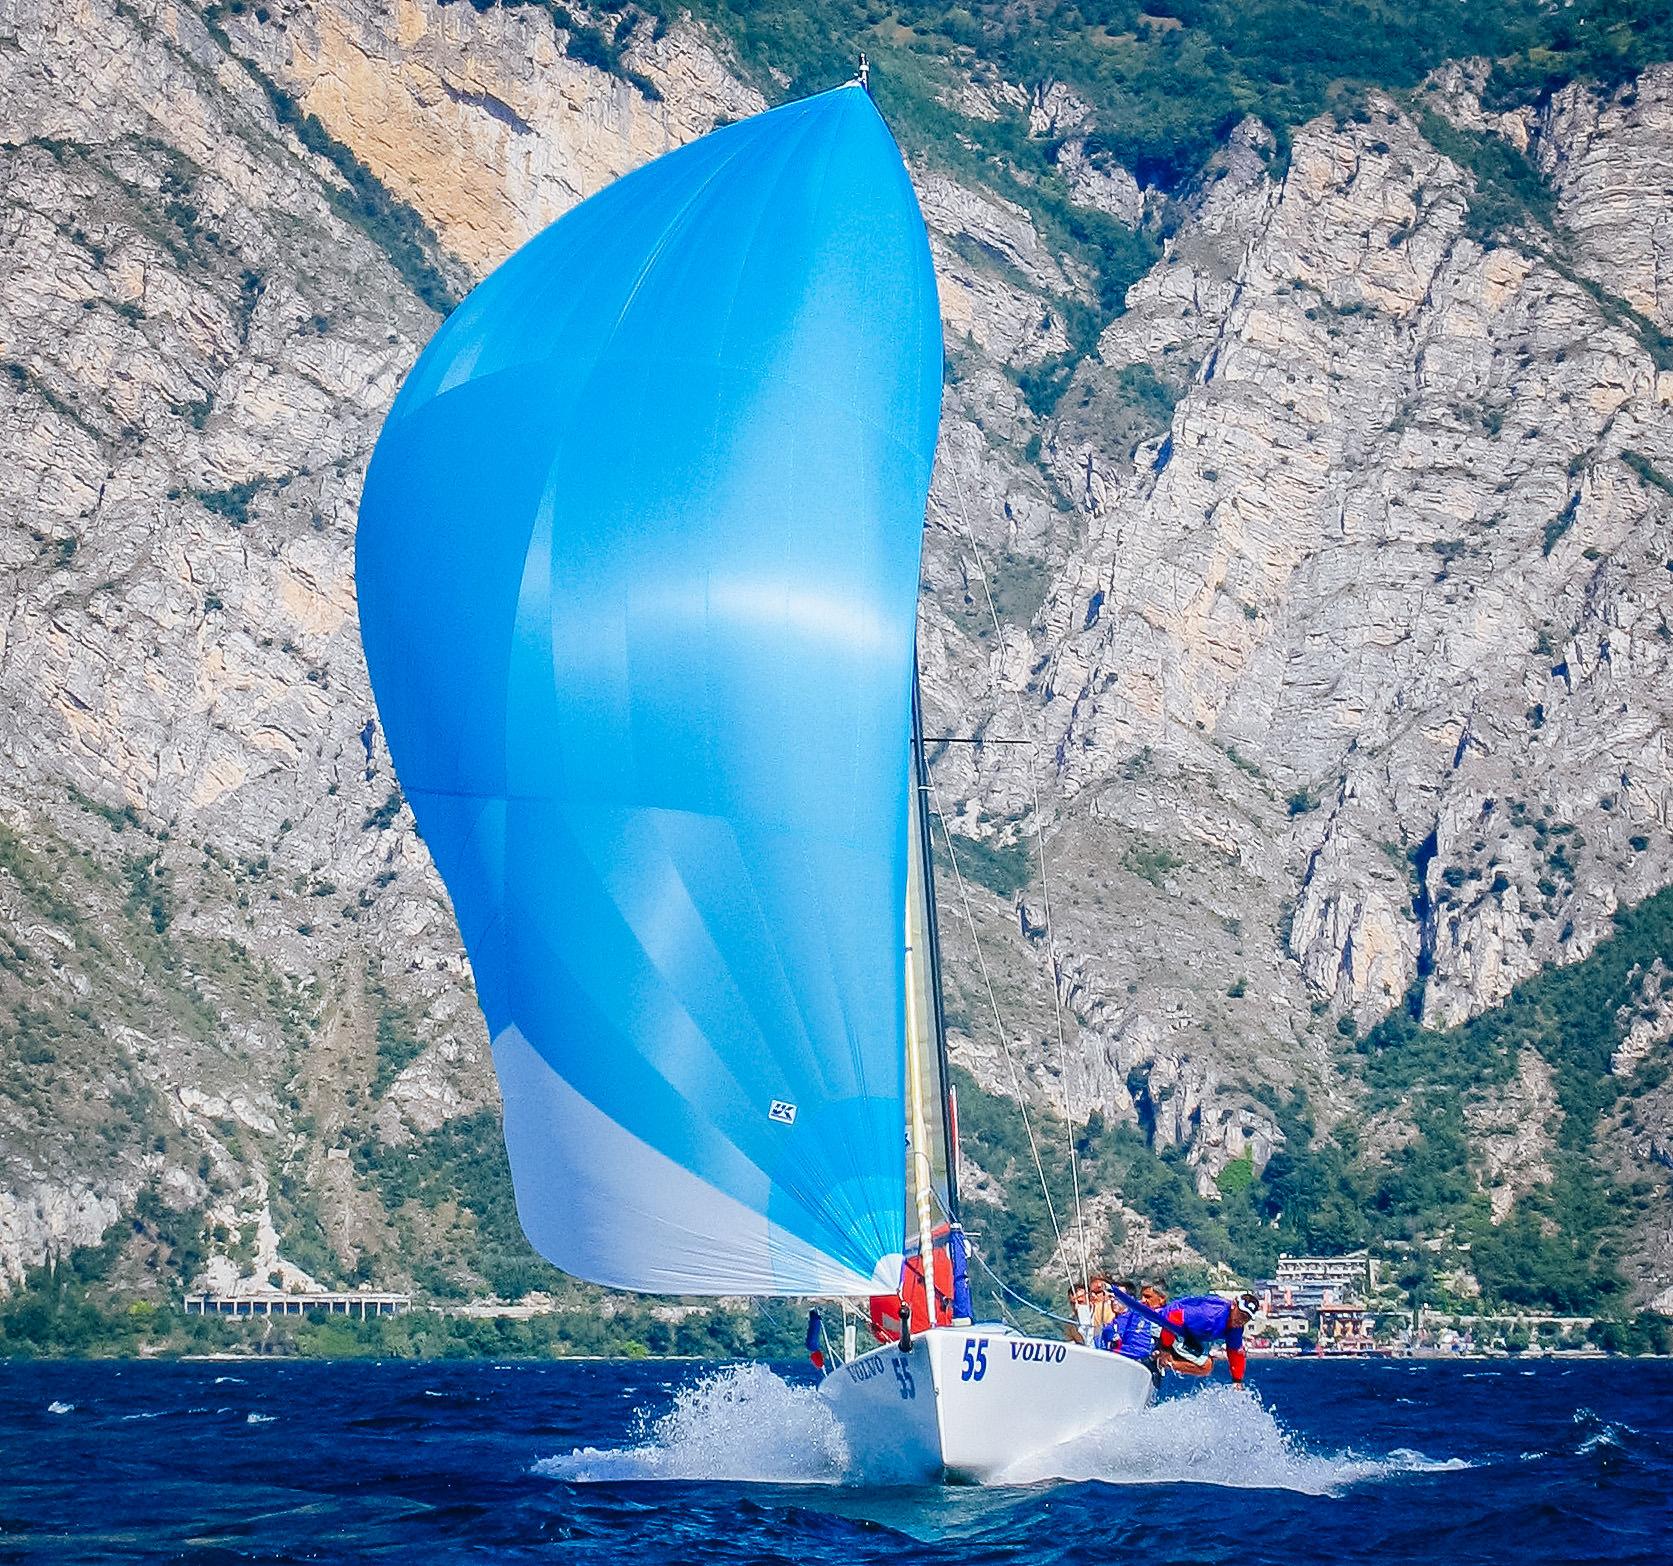 UK Sailmakers A2 Spinnaker Melges 24 Bow On Chute.jpg